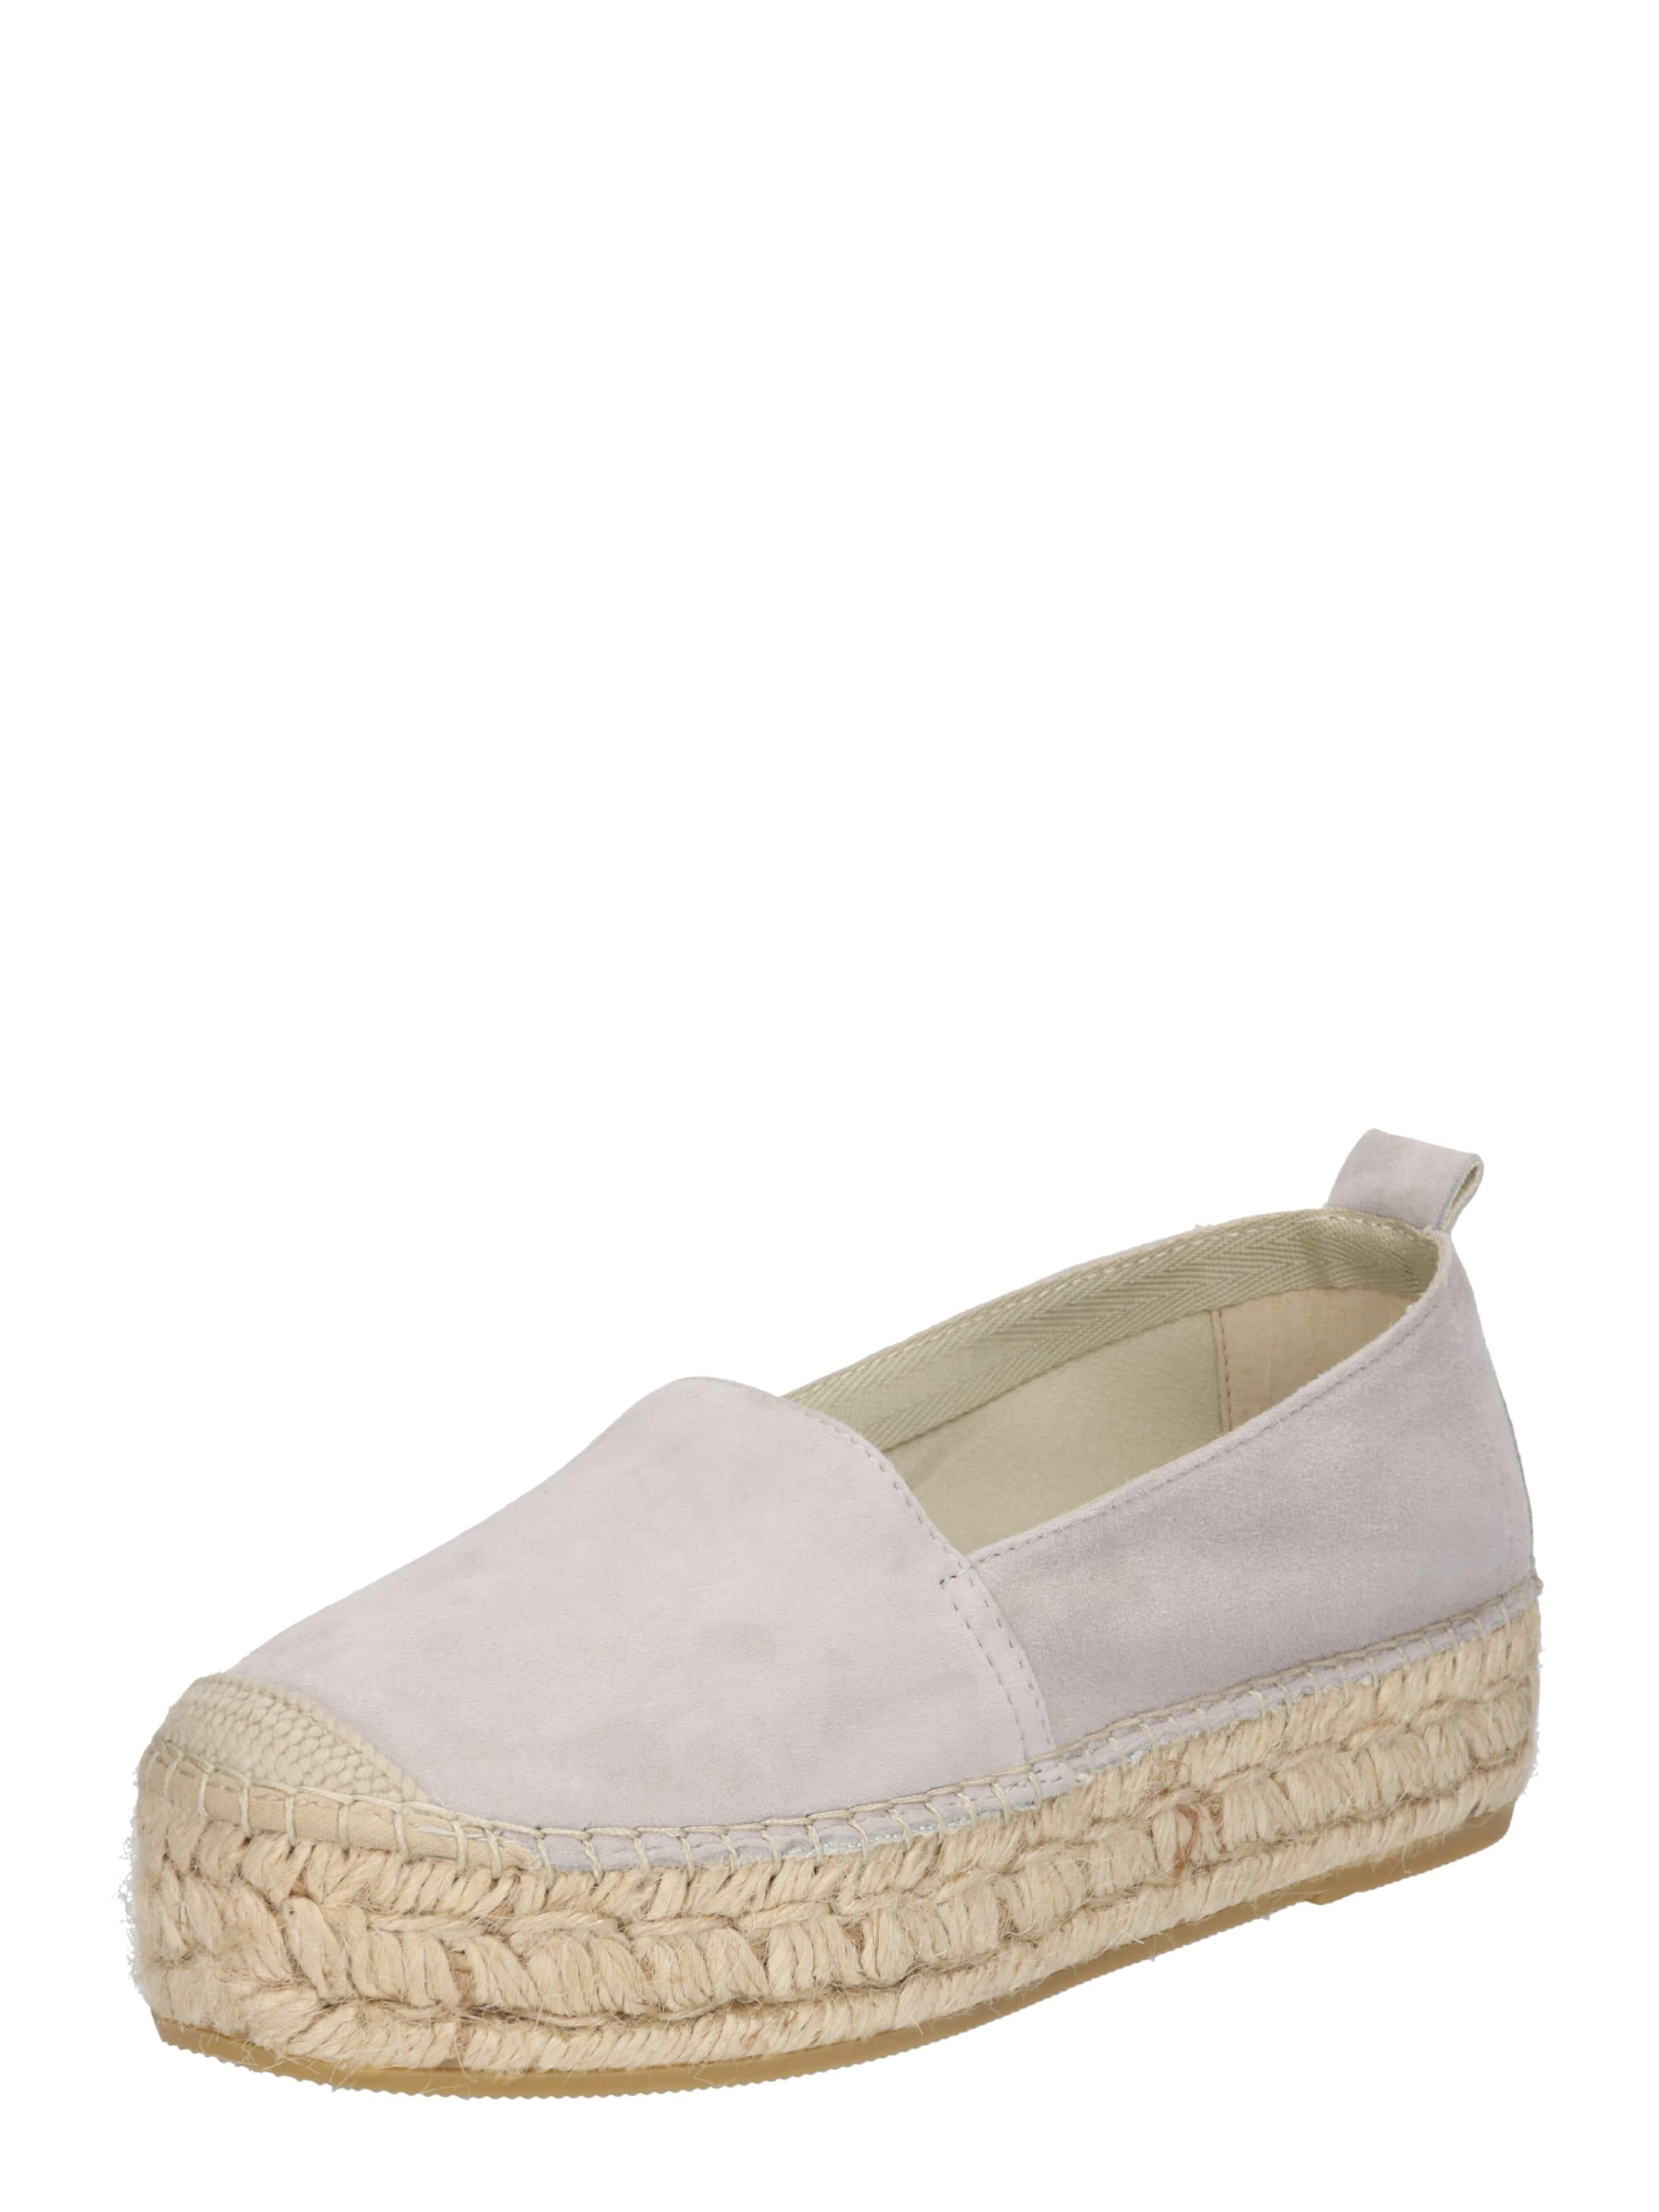 Haltbare Mode billige Schuhe Vidorreta | Espadrilles Schuhe Gut Gut Gut getragene Schuhe 143928